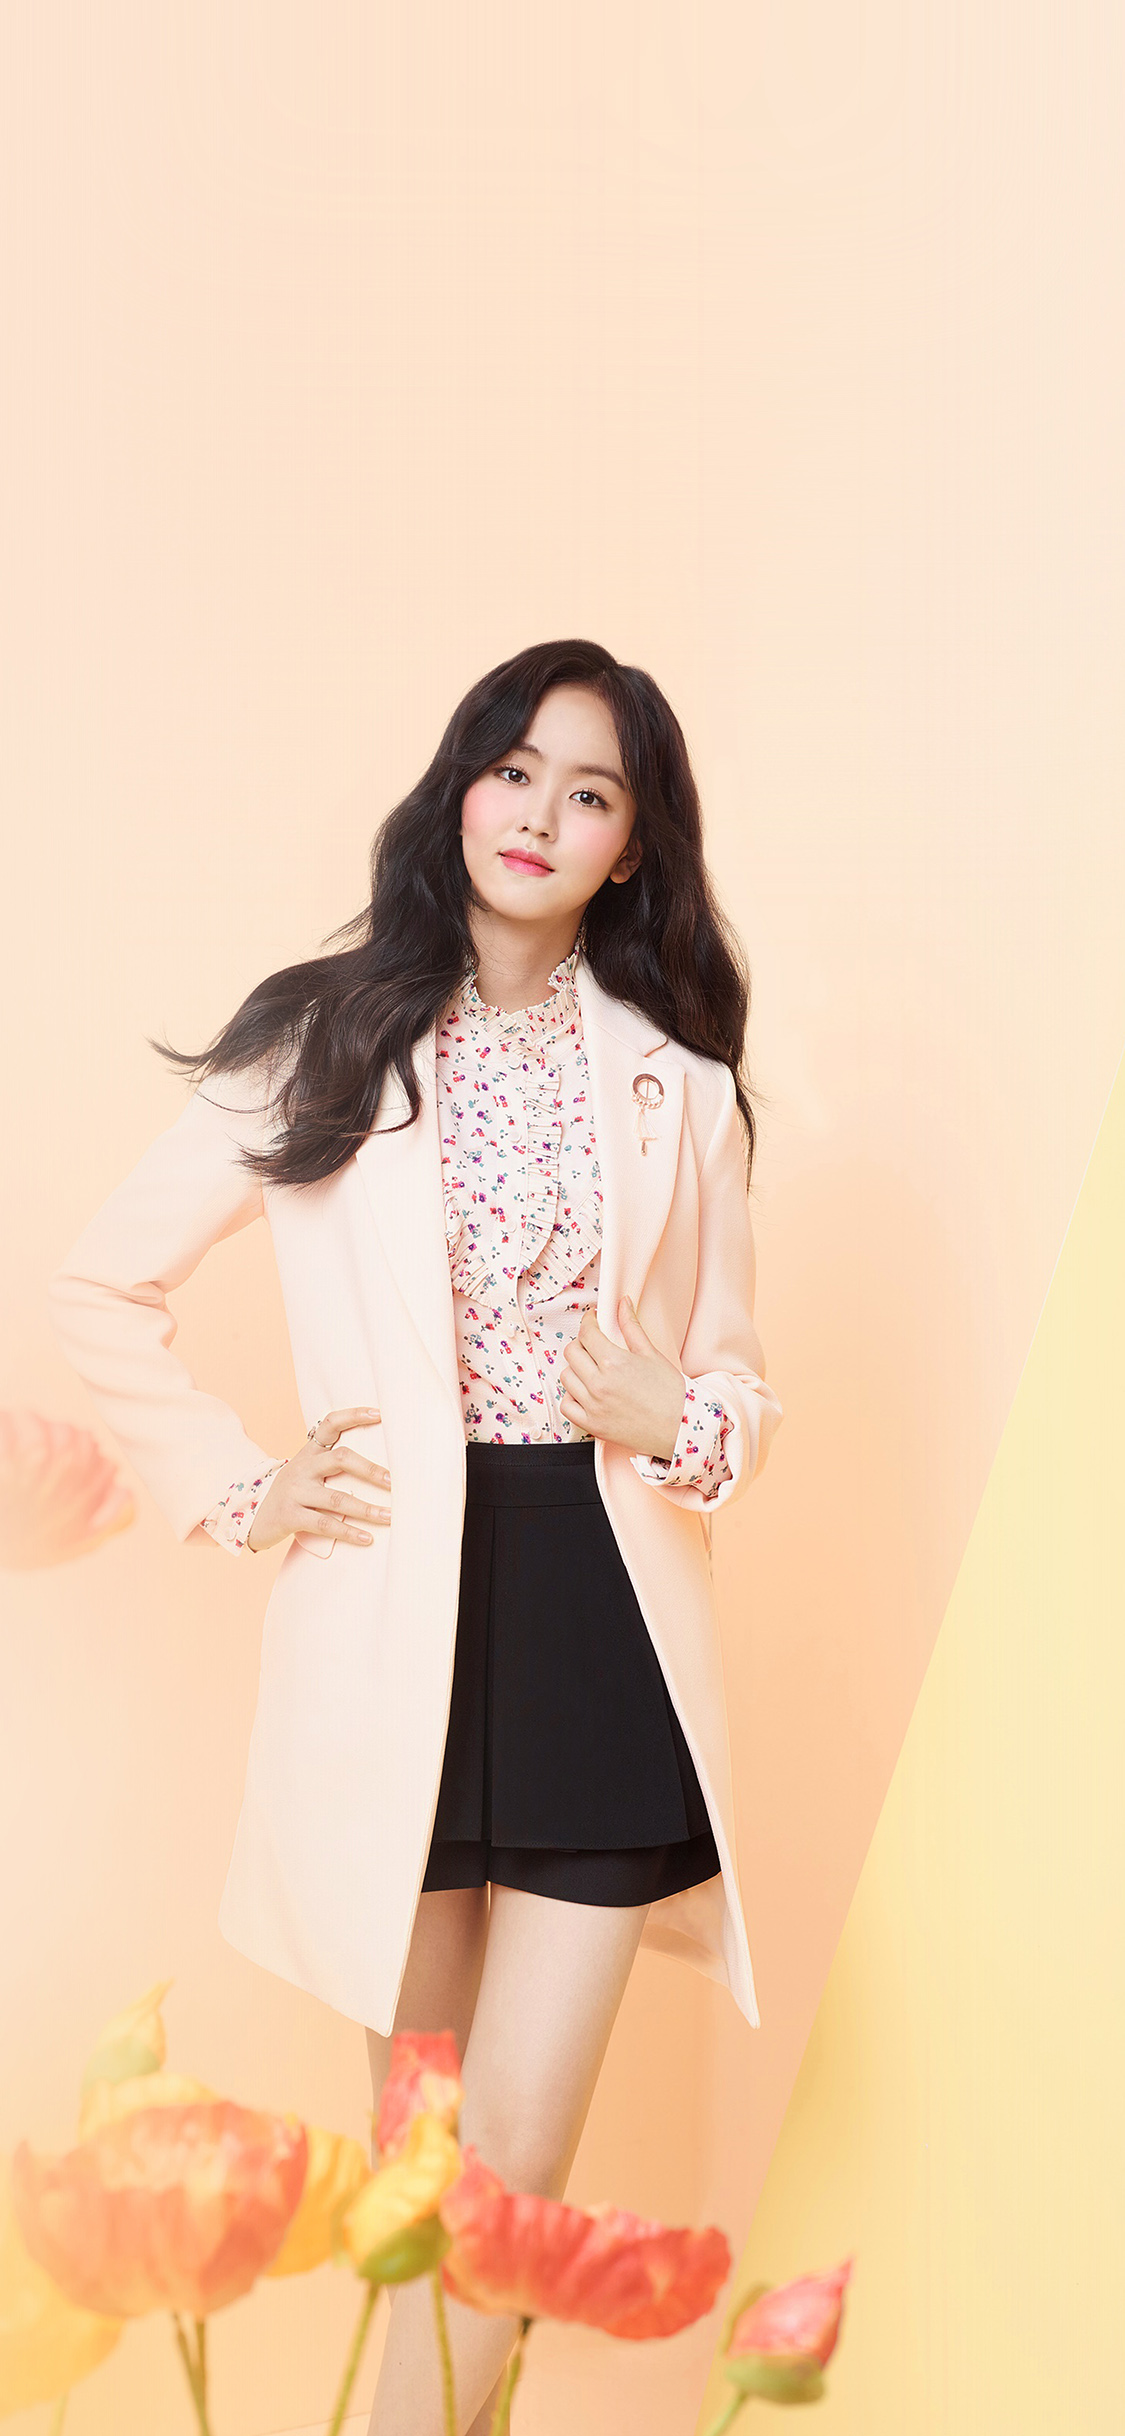 Droid X Girl Wallpaper Hm67 Kpop Girl Pink Pastel Color Wallpaper